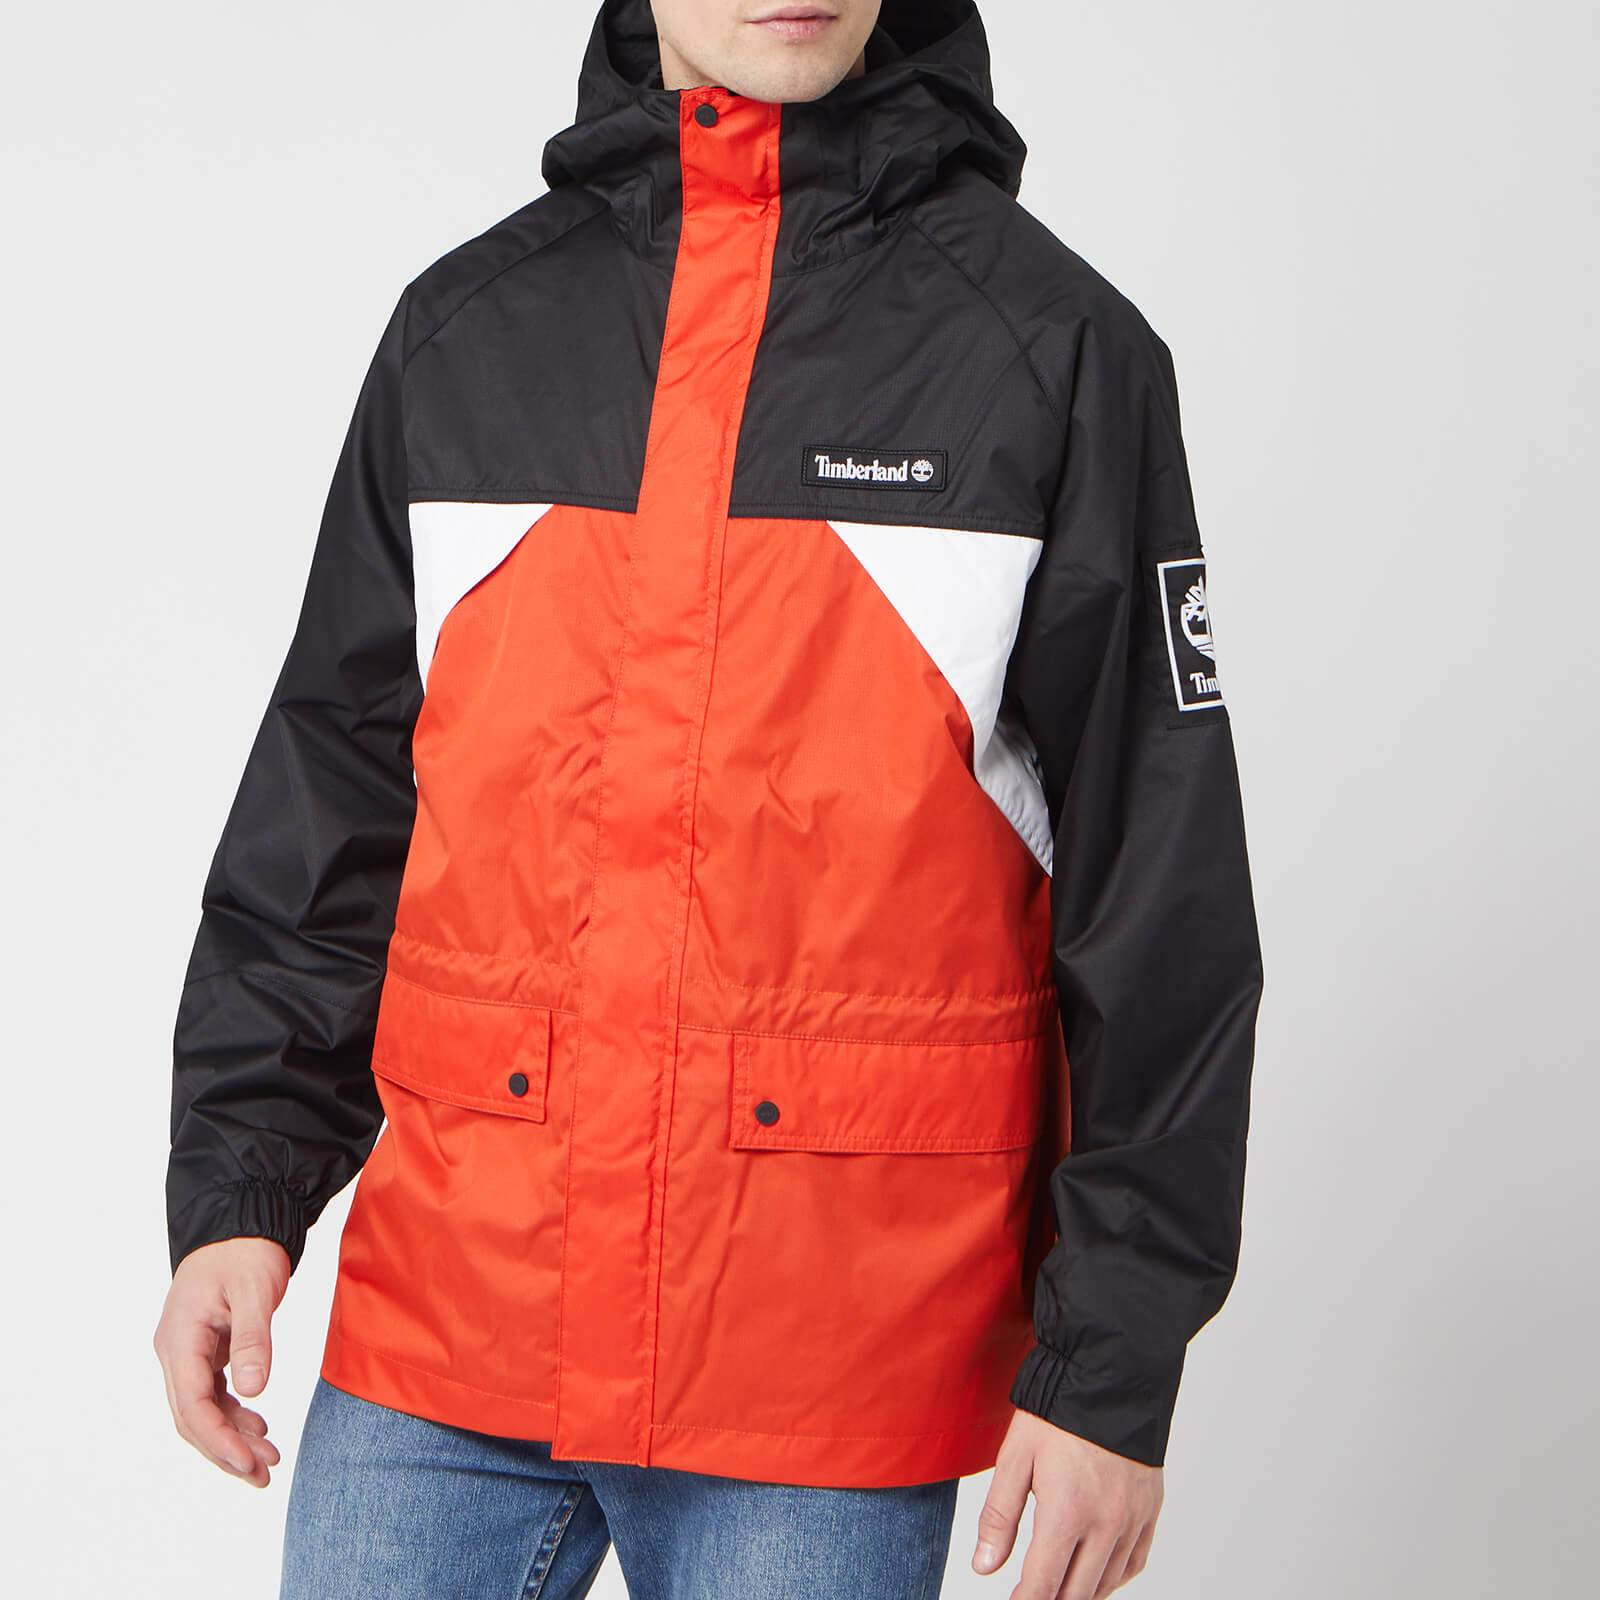 Timberland Men's Outdoor Archive Weather Breaker Coat - White/Spicy Orange/Black - XL